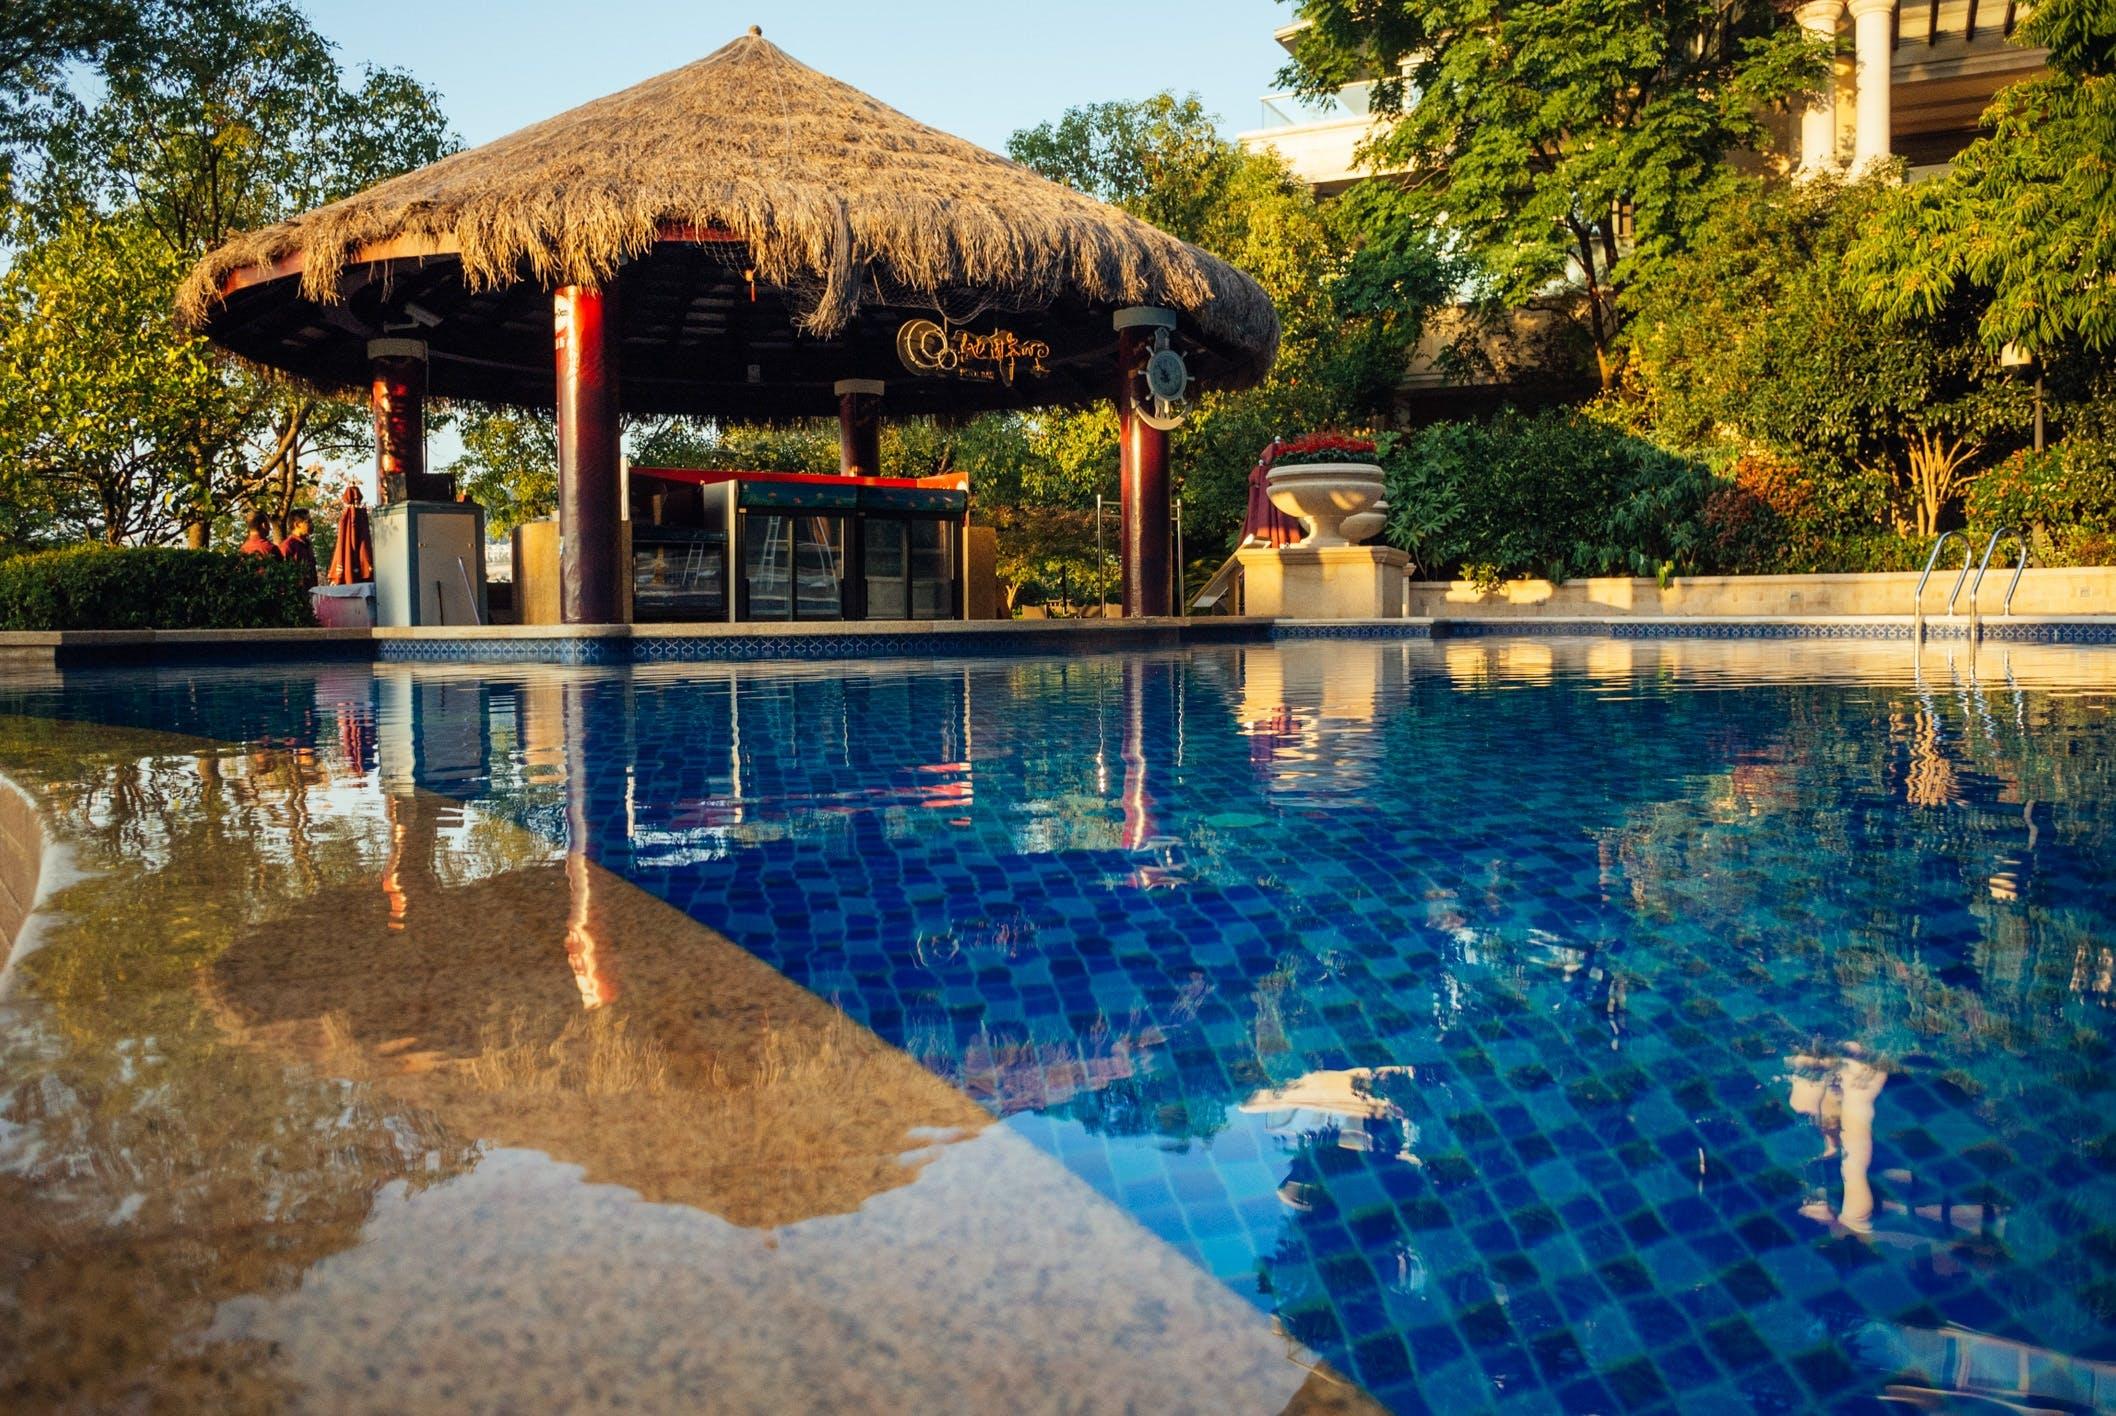 Fotos de stock gratuitas de agua, arquitectura, centro turístico, hotel